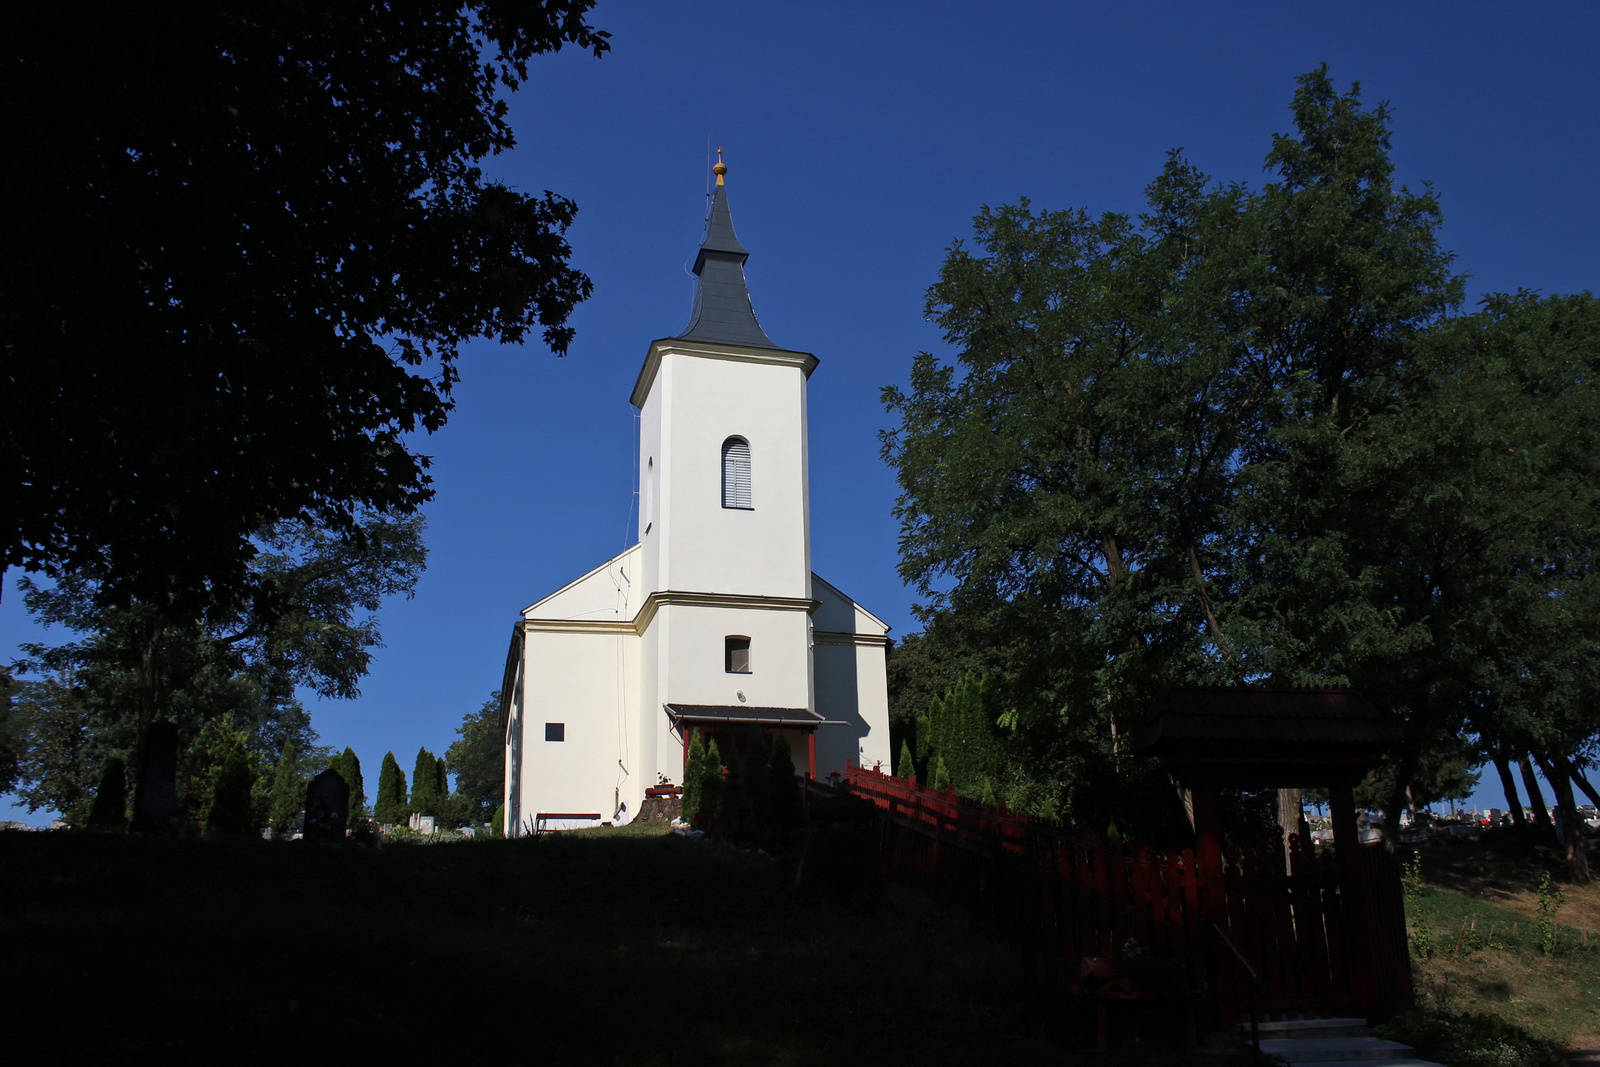 20180819-01-Abaujdevecser-Templom